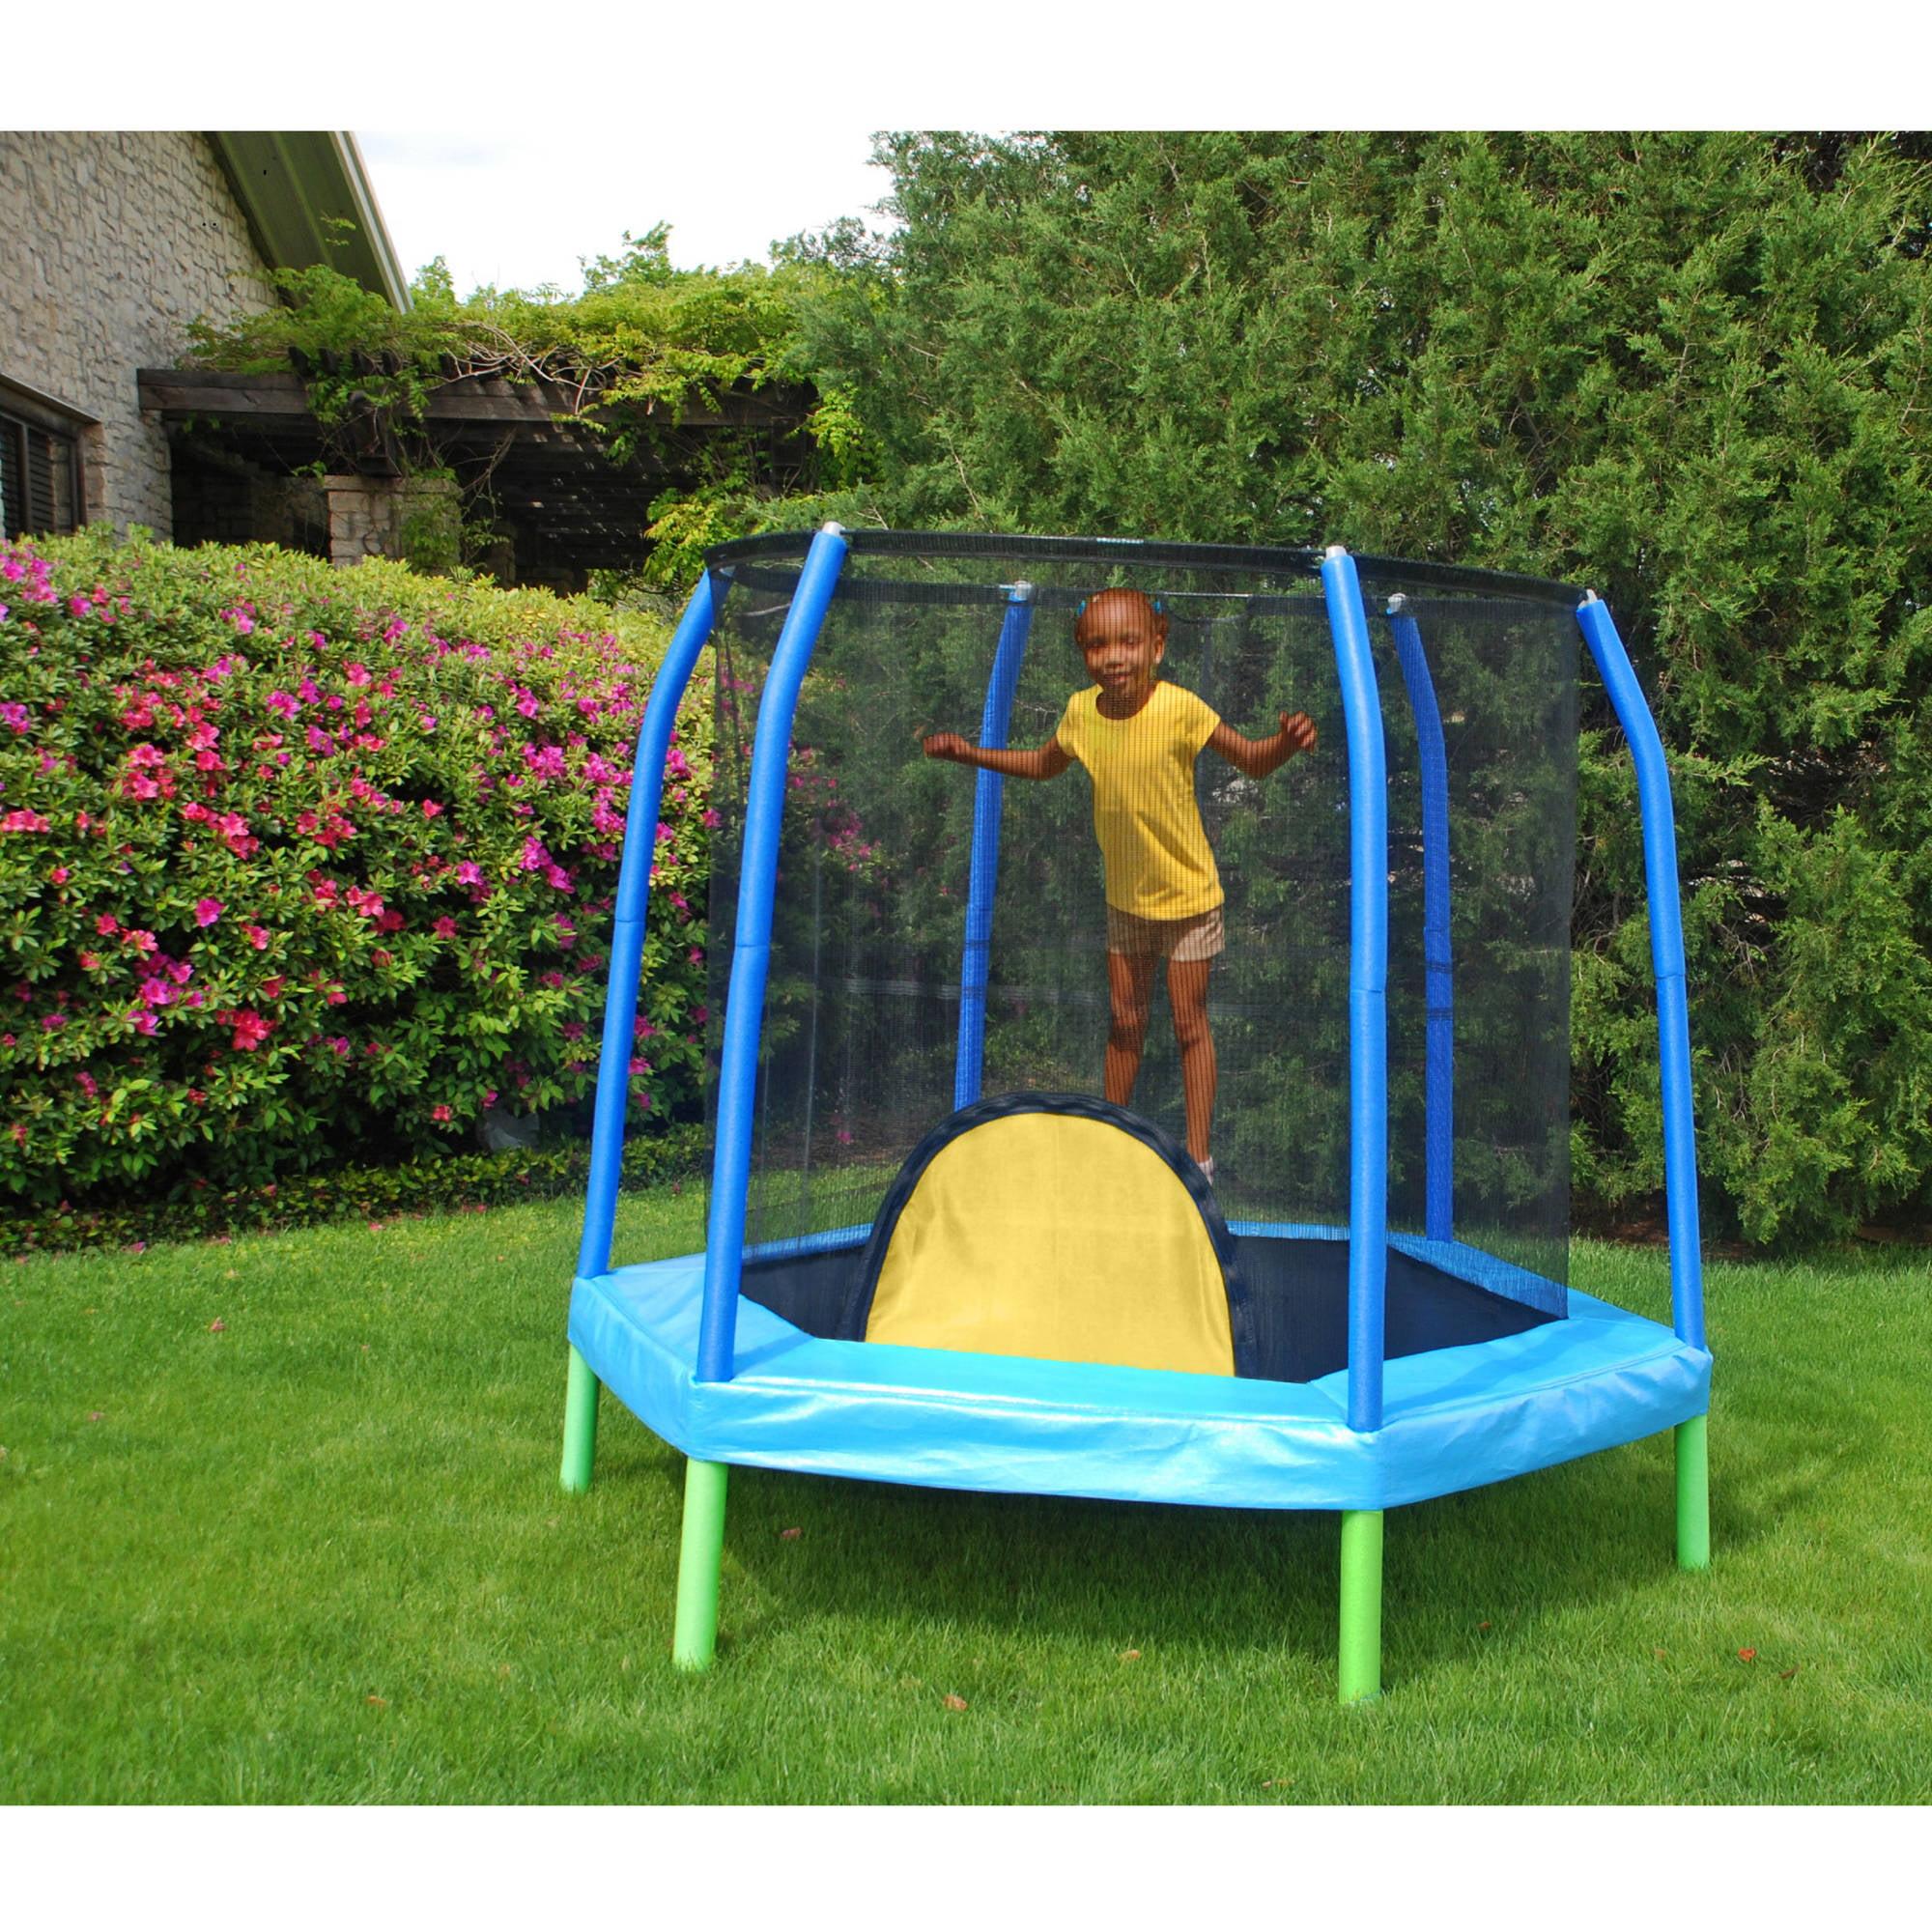 Bazoongi 7.5' Hexagonal Kids Combo Trampoline and Enclosure